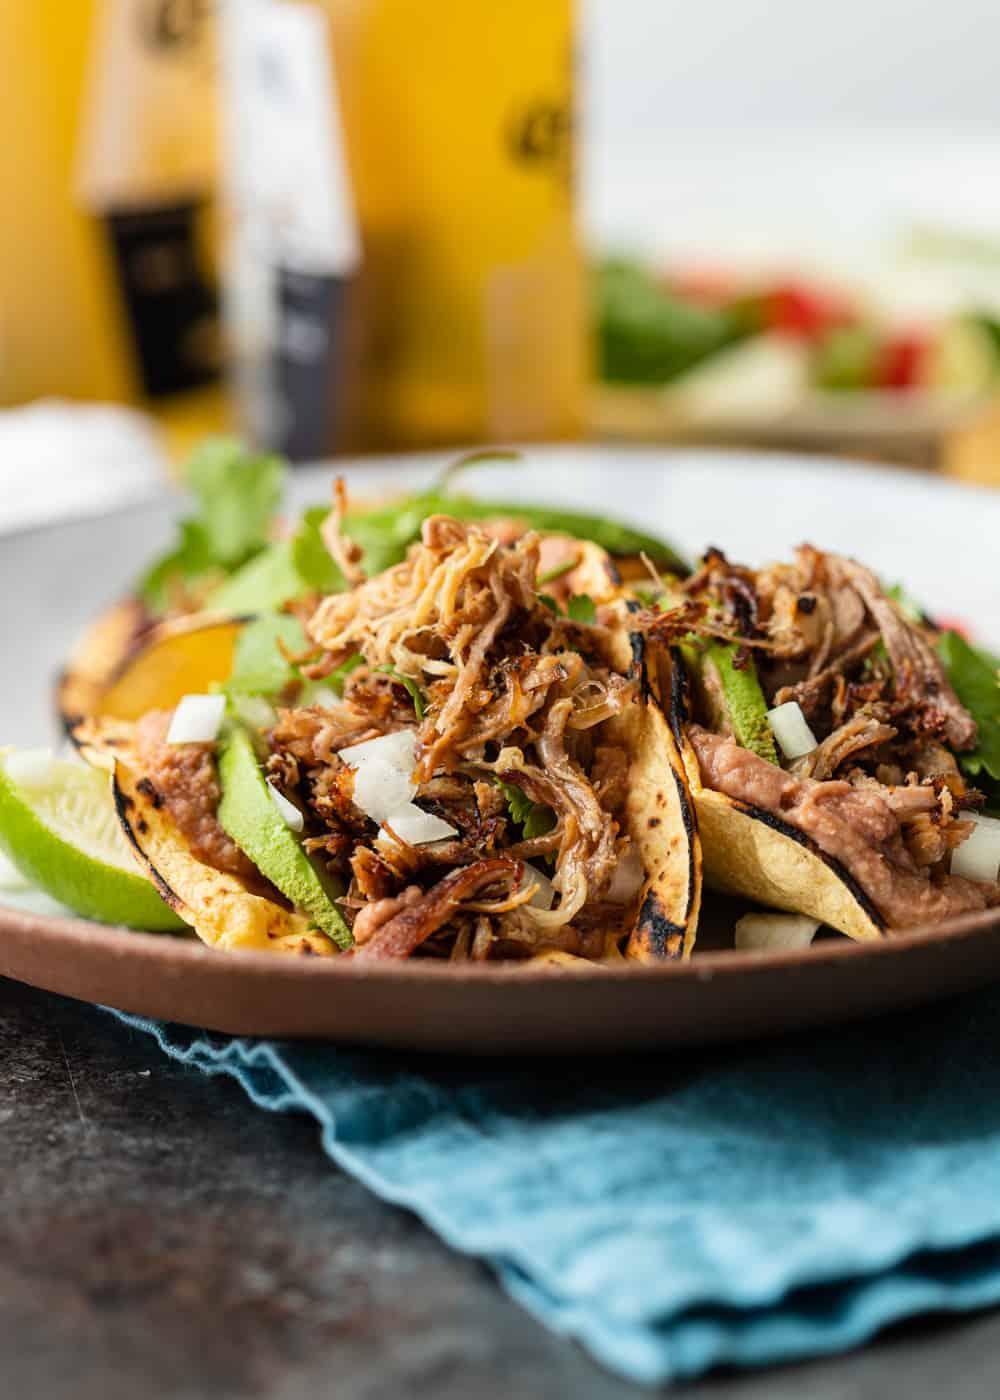 teo carnitas tacos on a plate with onion cilantro avocado